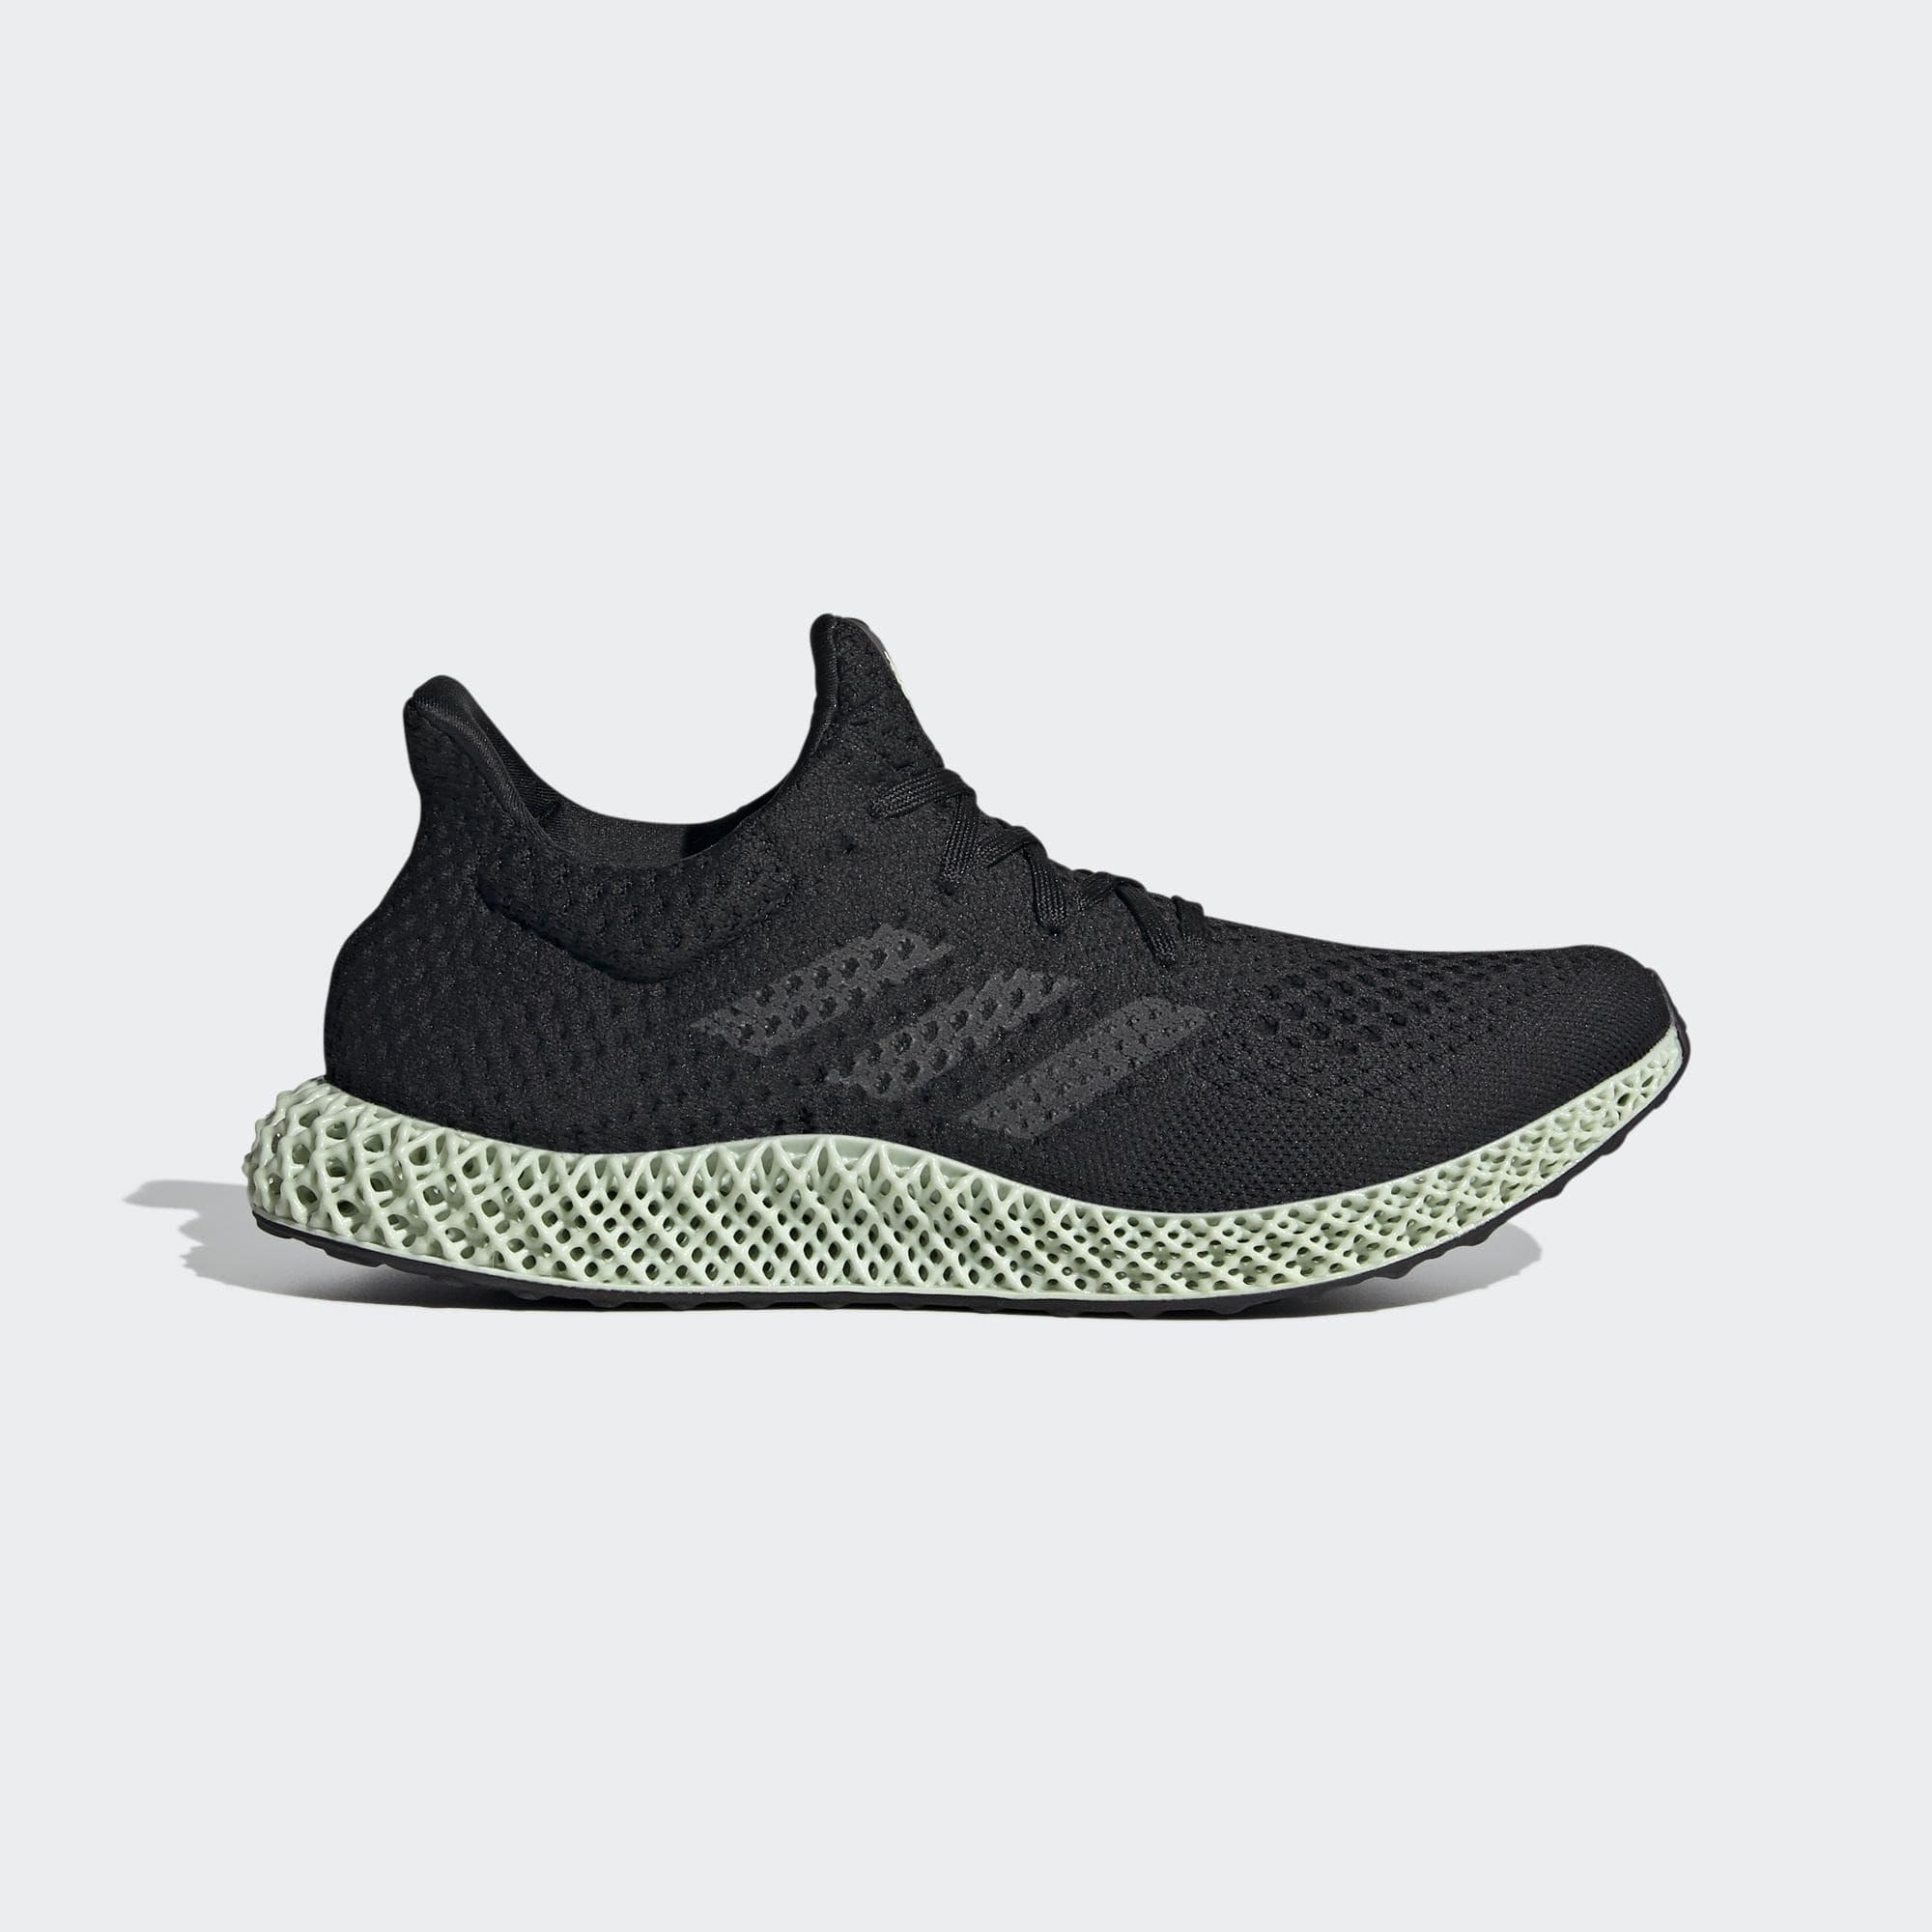 ADIDAS 4D FUTURECRAFT 男女 慢跑鞋 黑綠